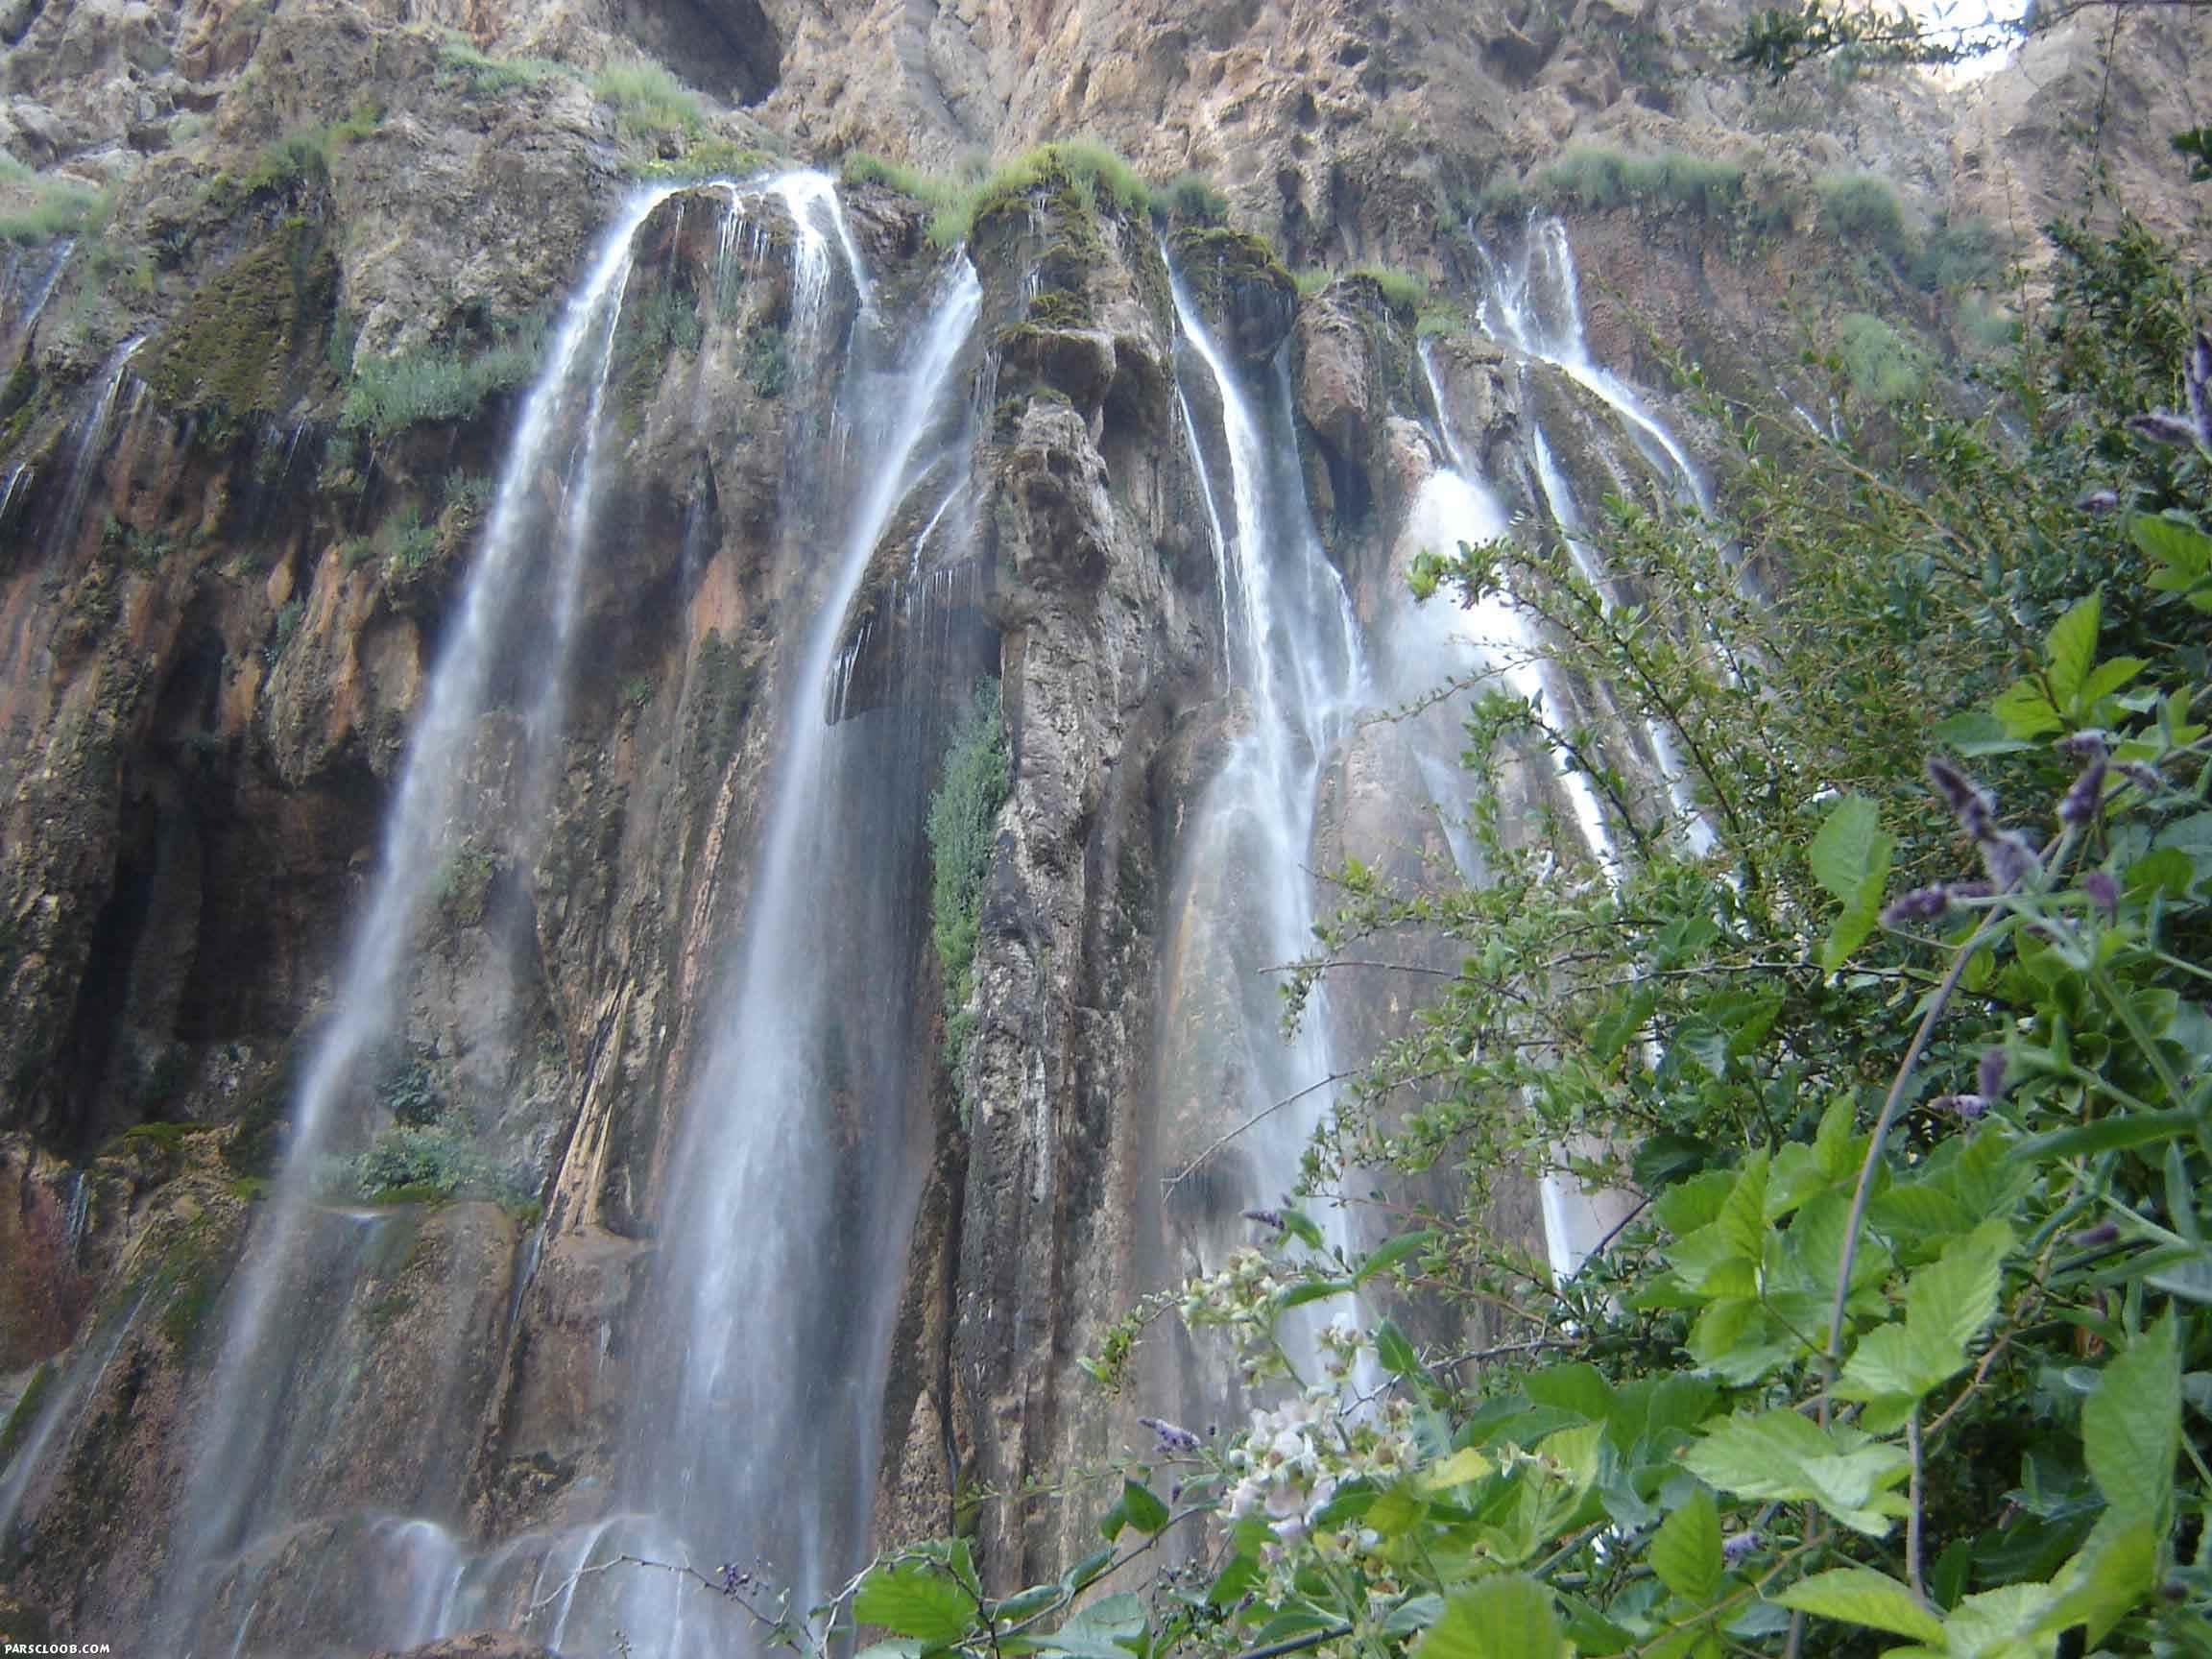 Kuh Mare Sorkhi Waterfall (کوهمره سرخی آبشار), Fars, Iran